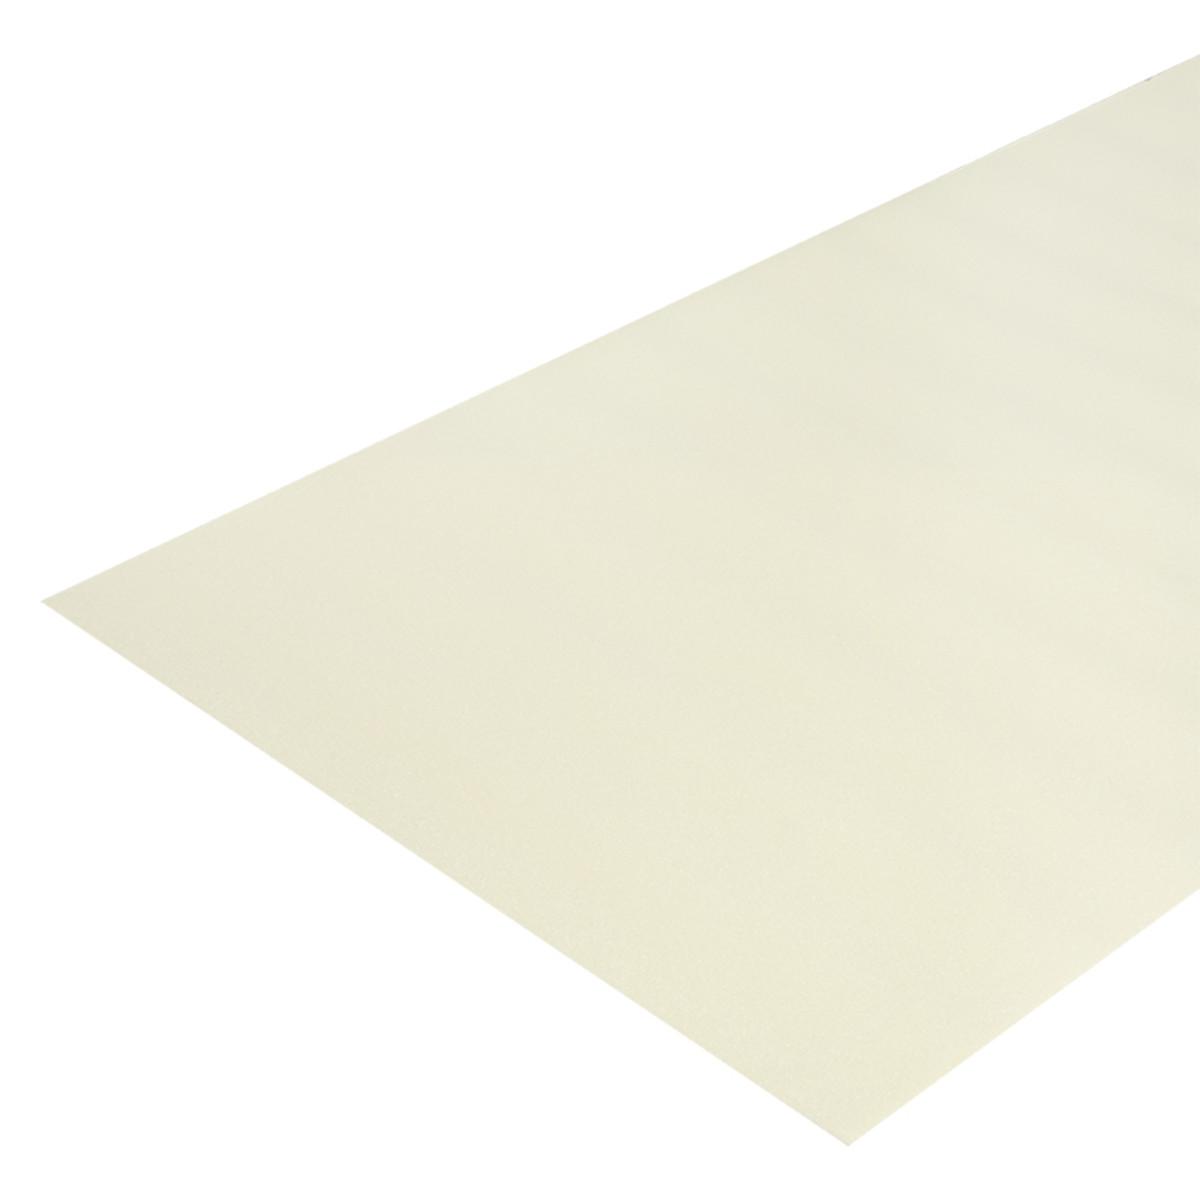 Подложка-гармошка XPS цвет желтый 1050х500х2 см 105 м2